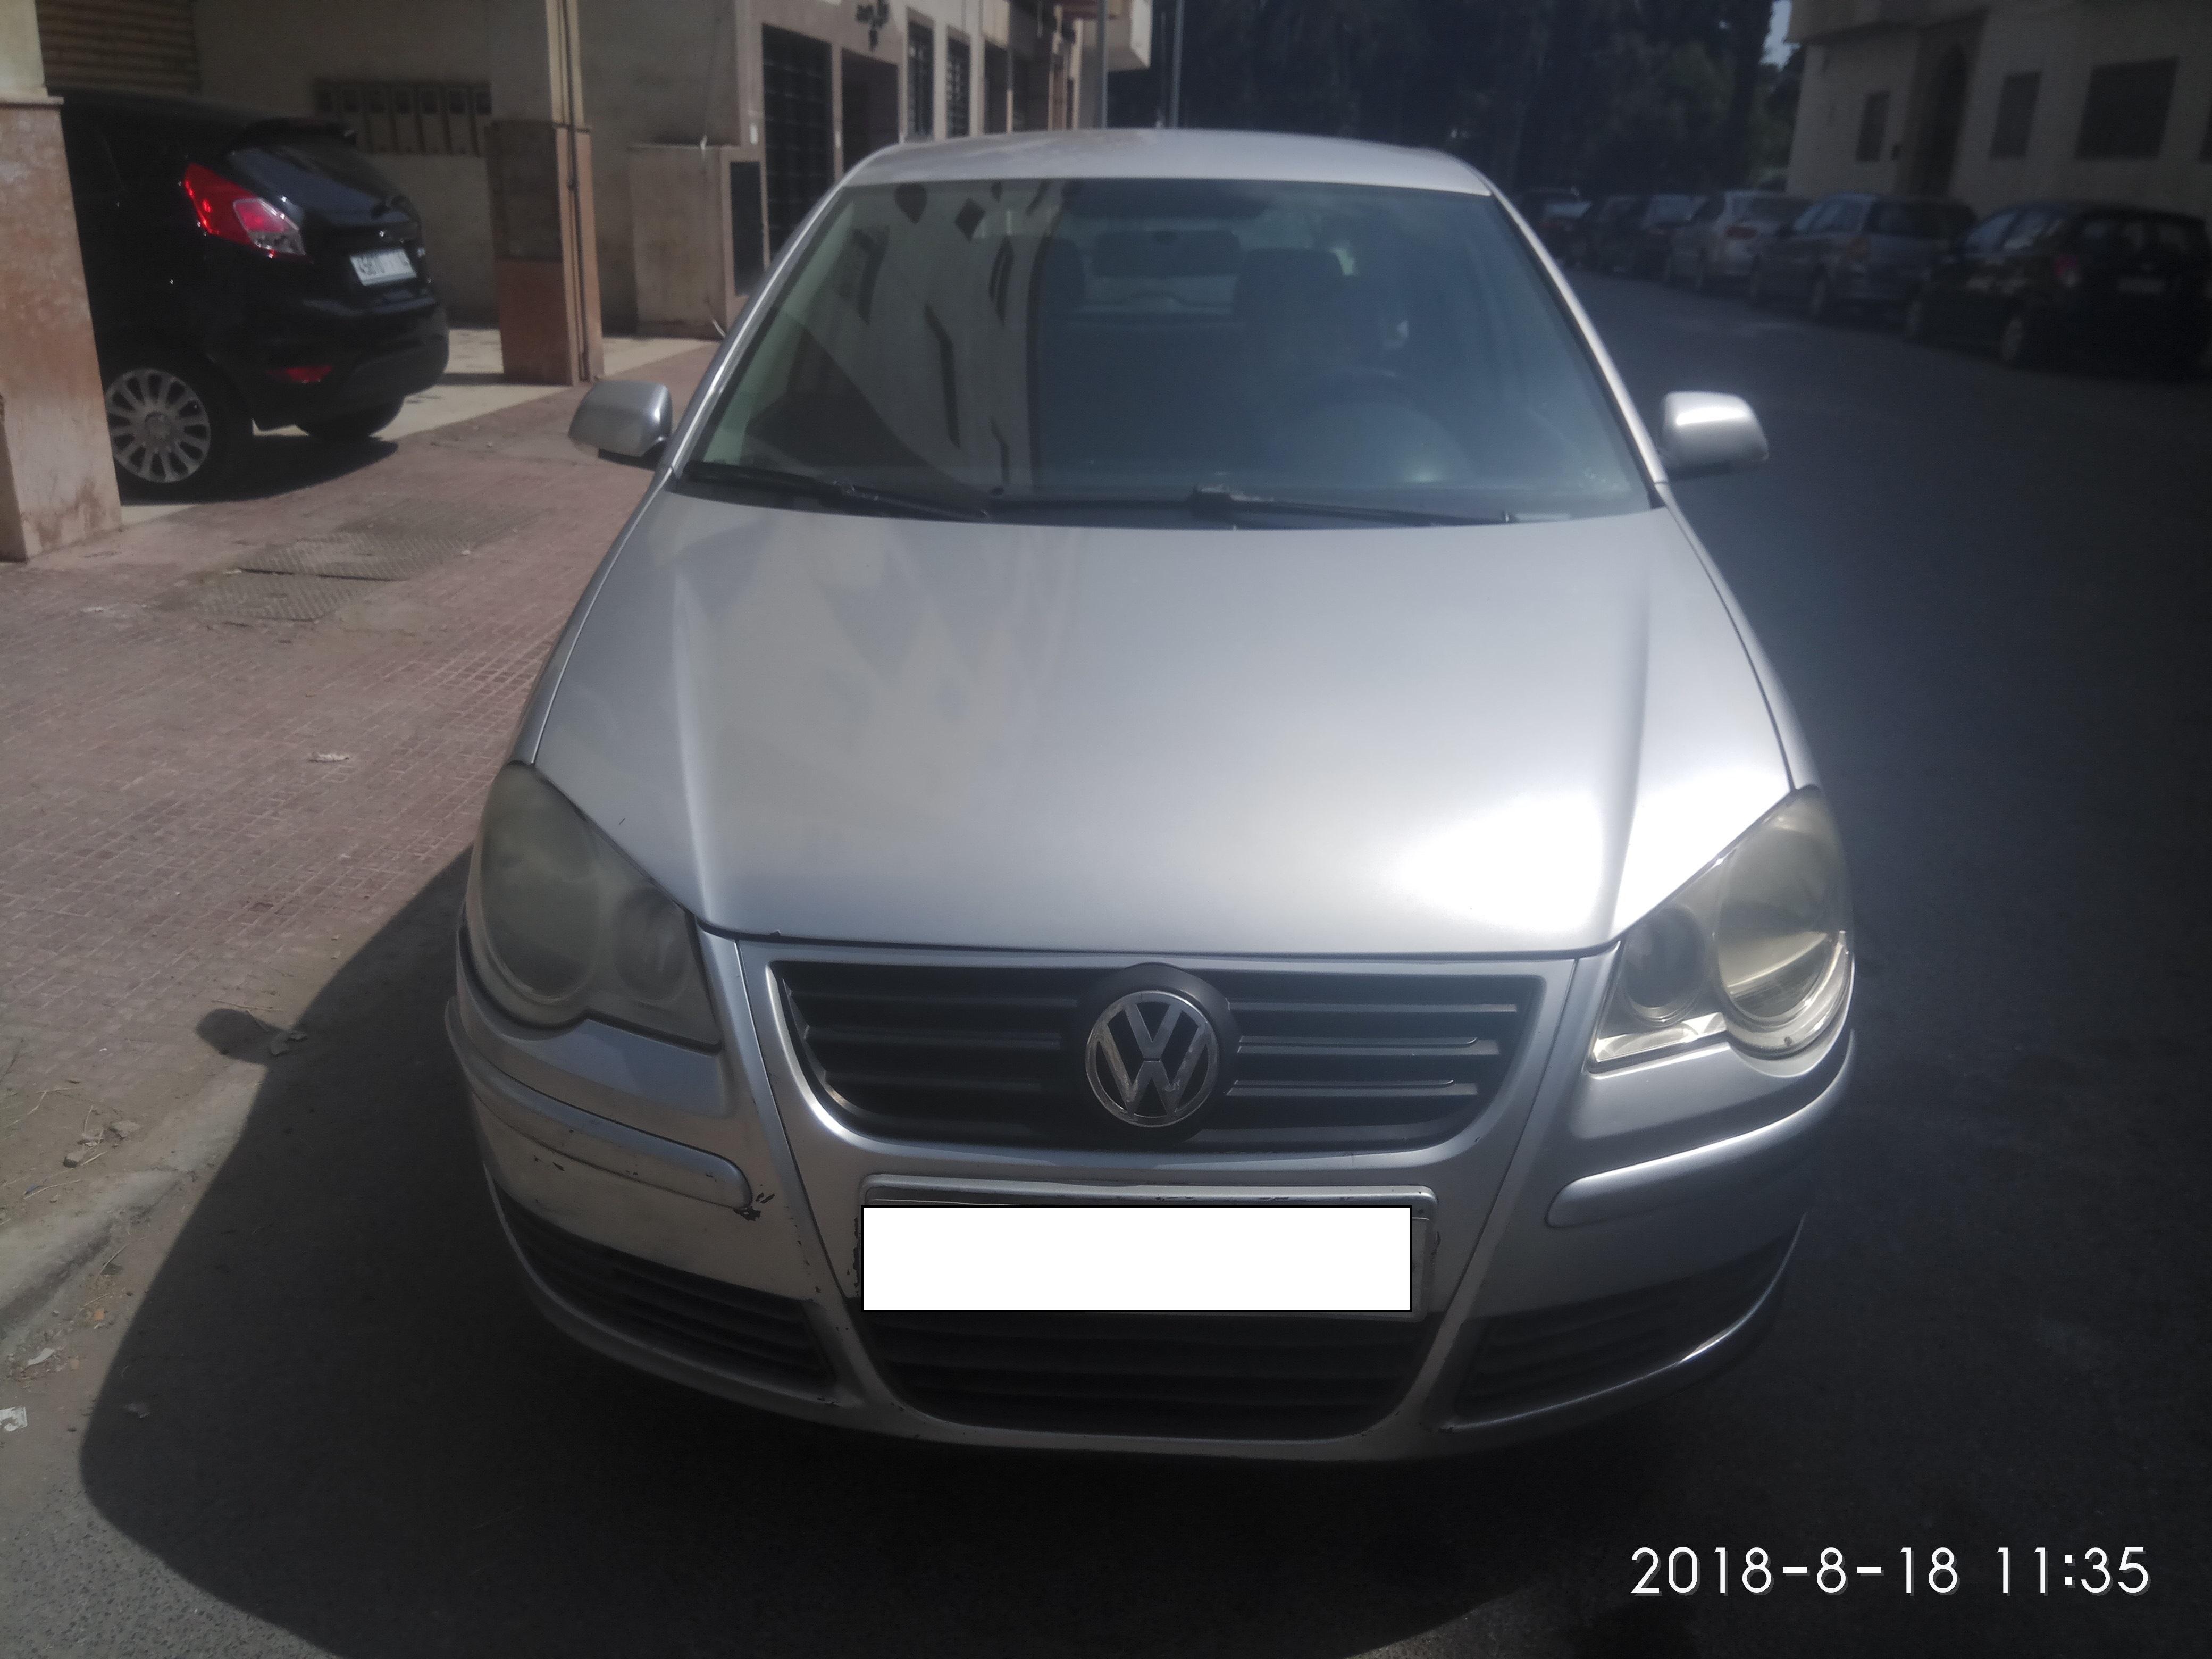 Volkswagen Polo SDI 1.9 - Model 2005